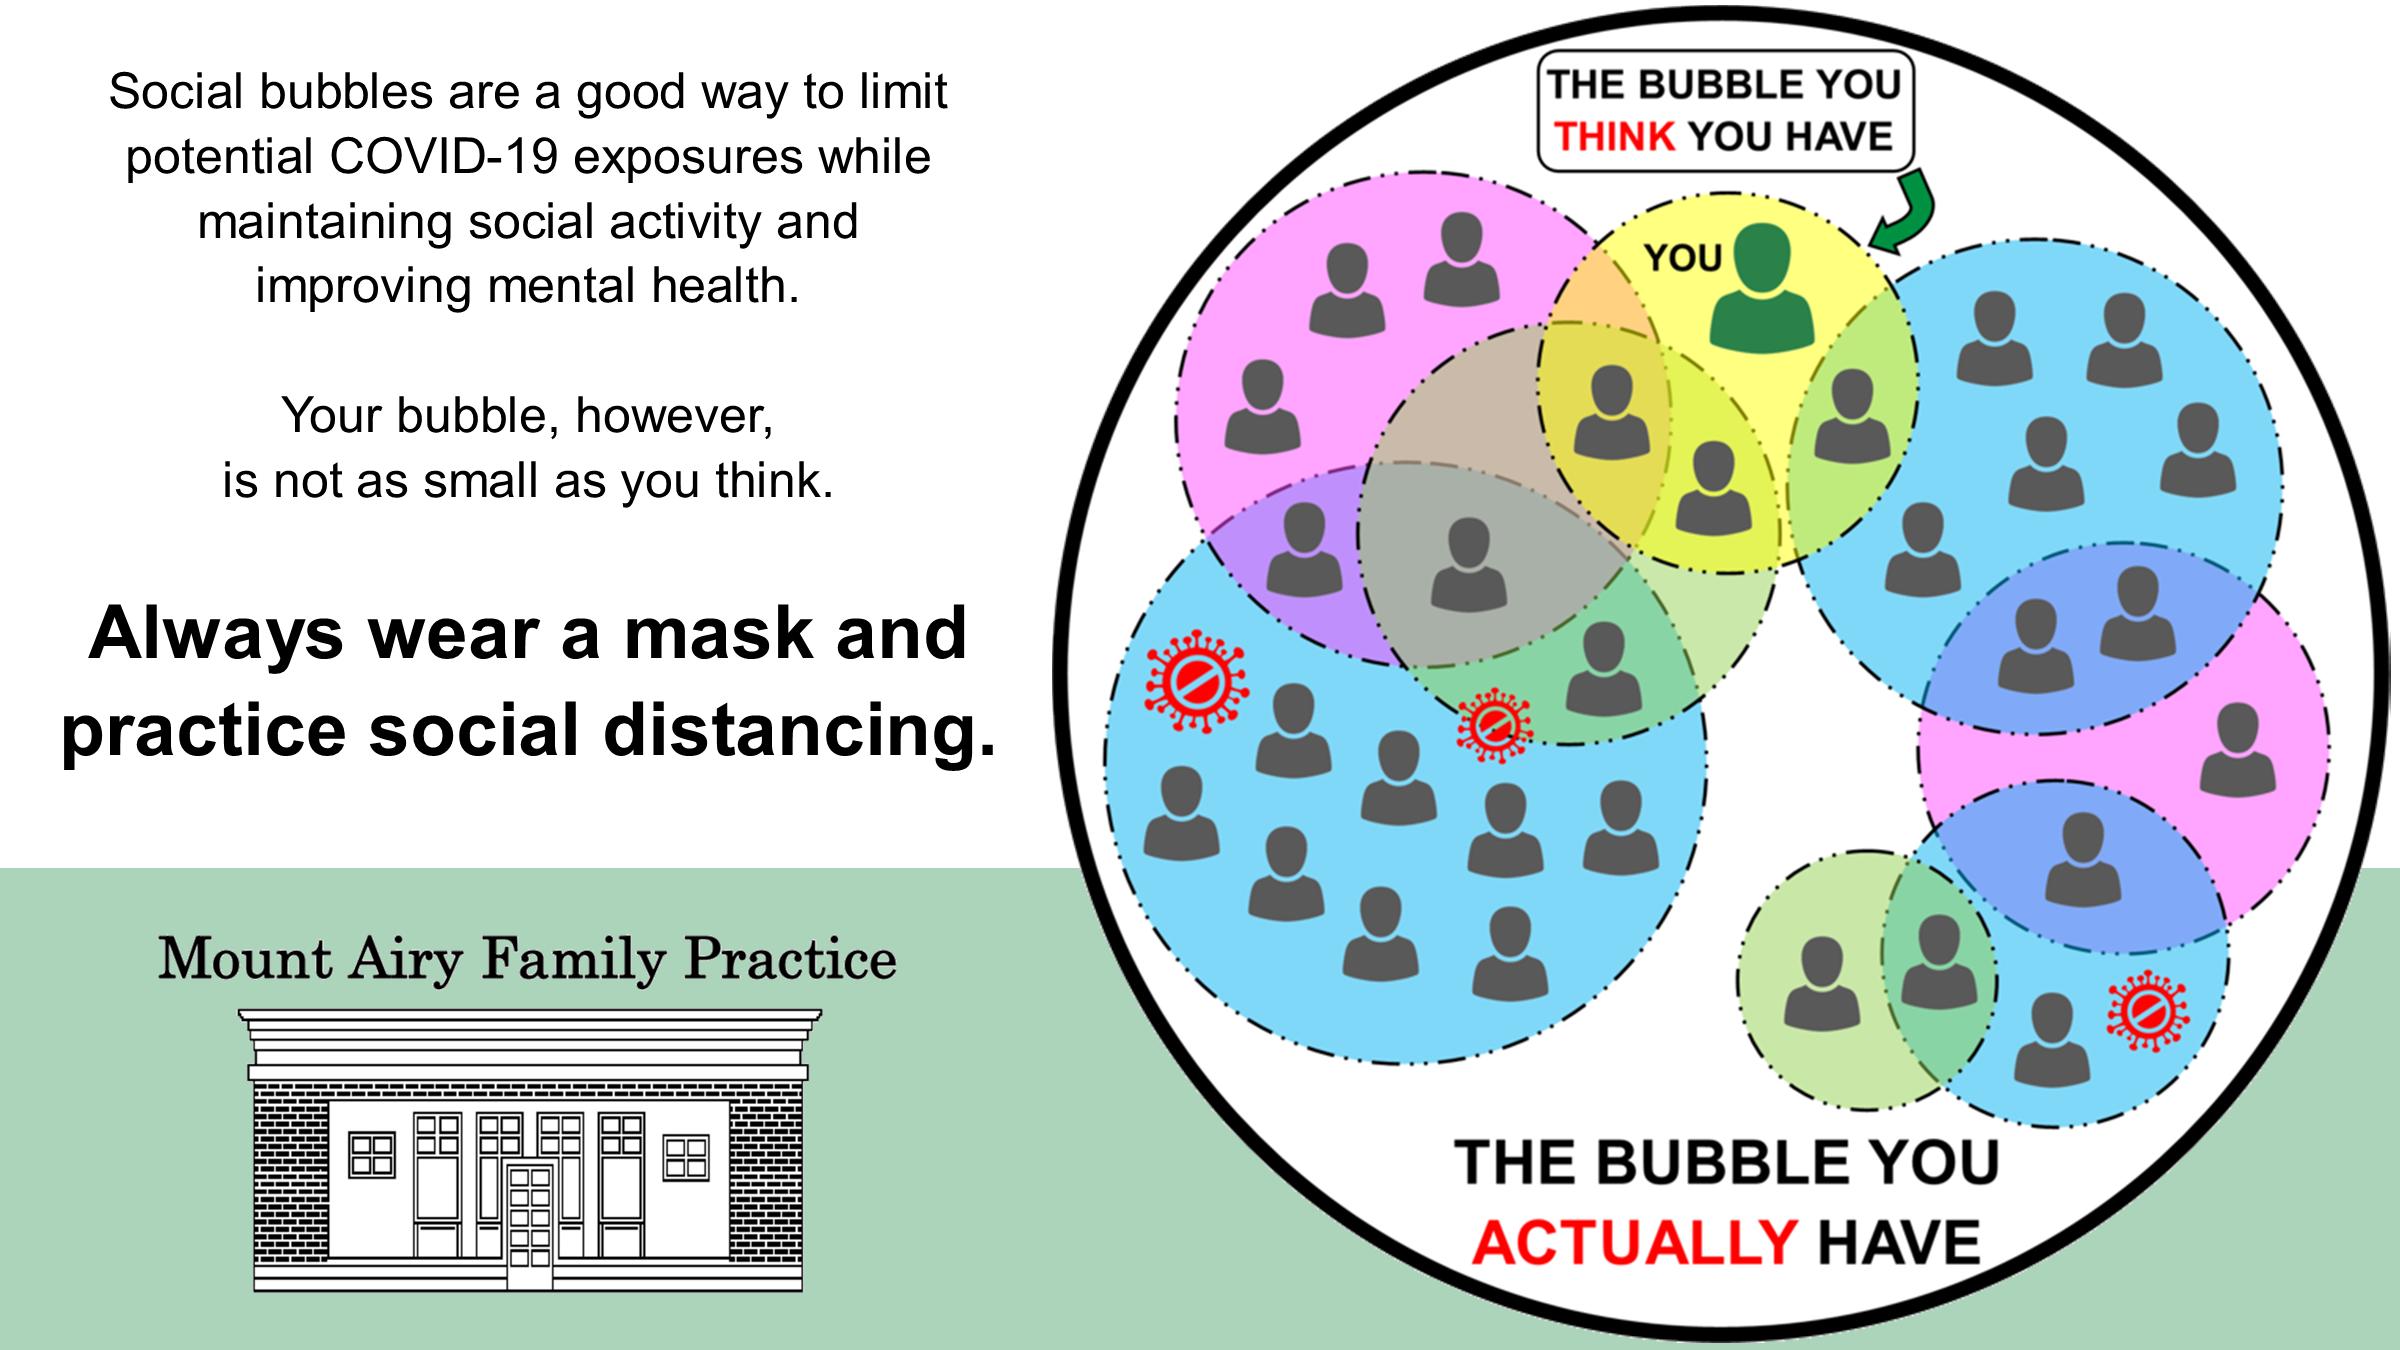 COVID-19 Social Bubbles MAFP Social Image